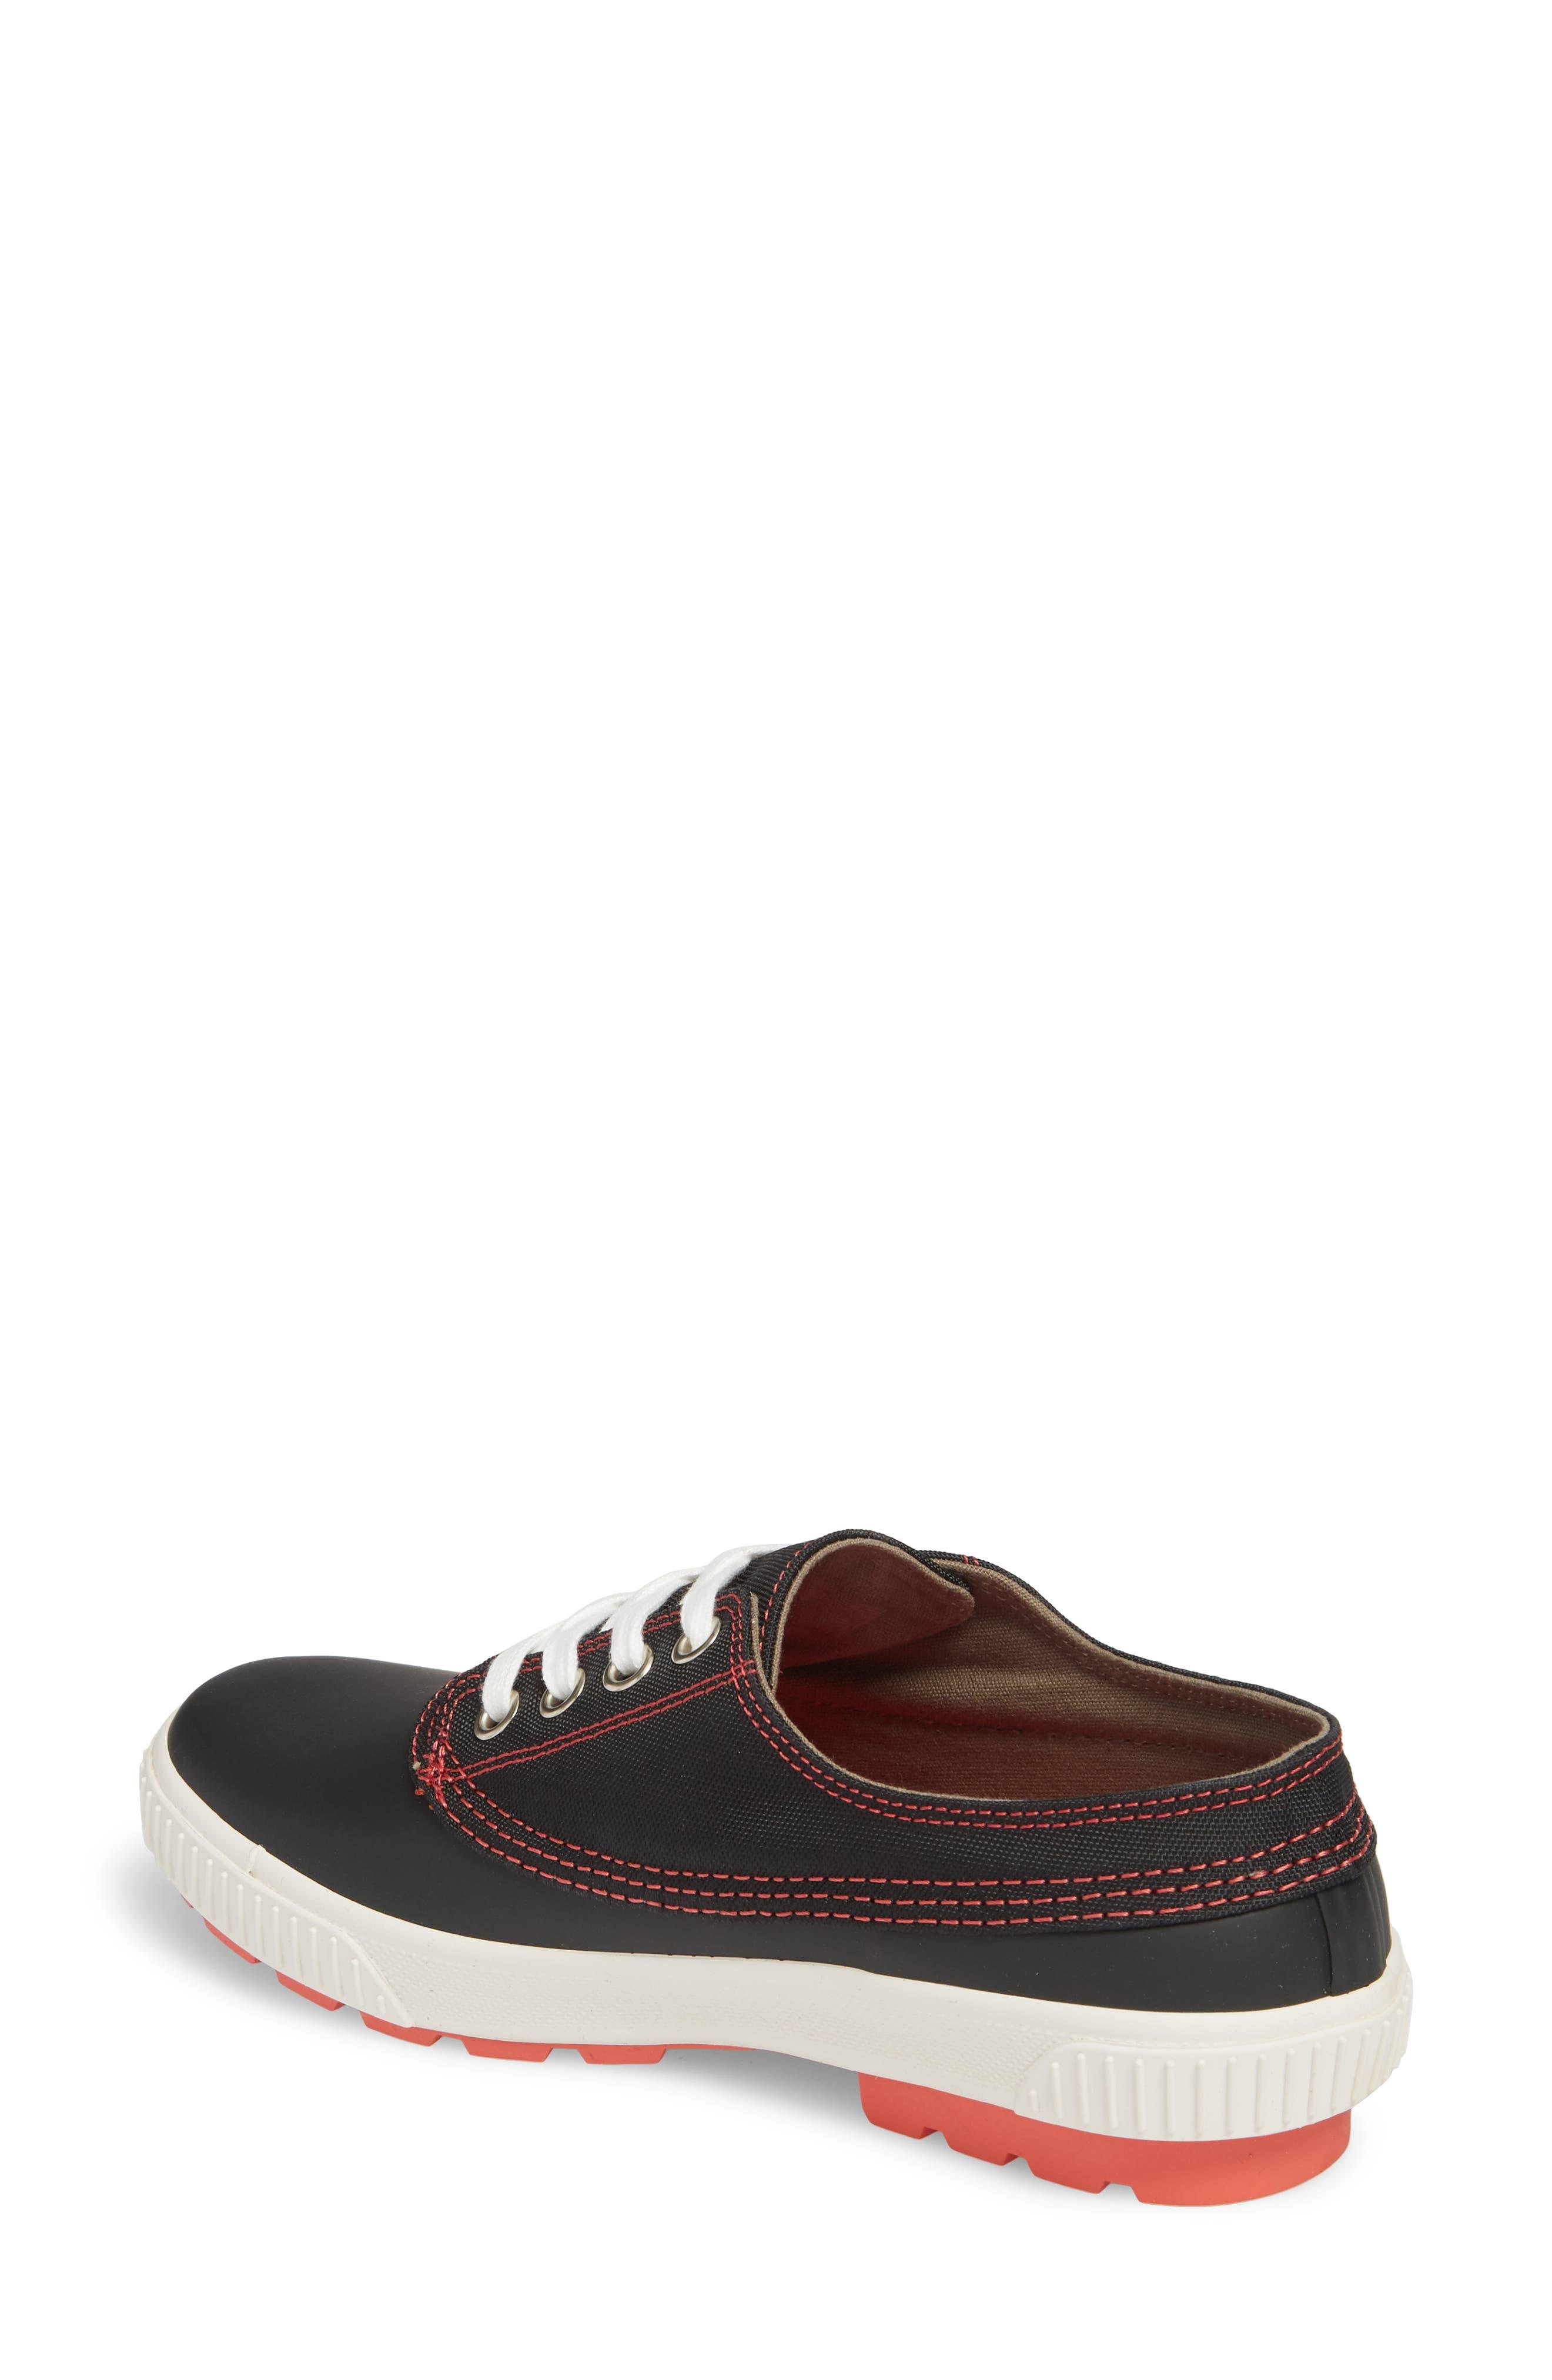 Dash Duck Sneaker,                             Alternate thumbnail 2, color,                             Black/ Coral